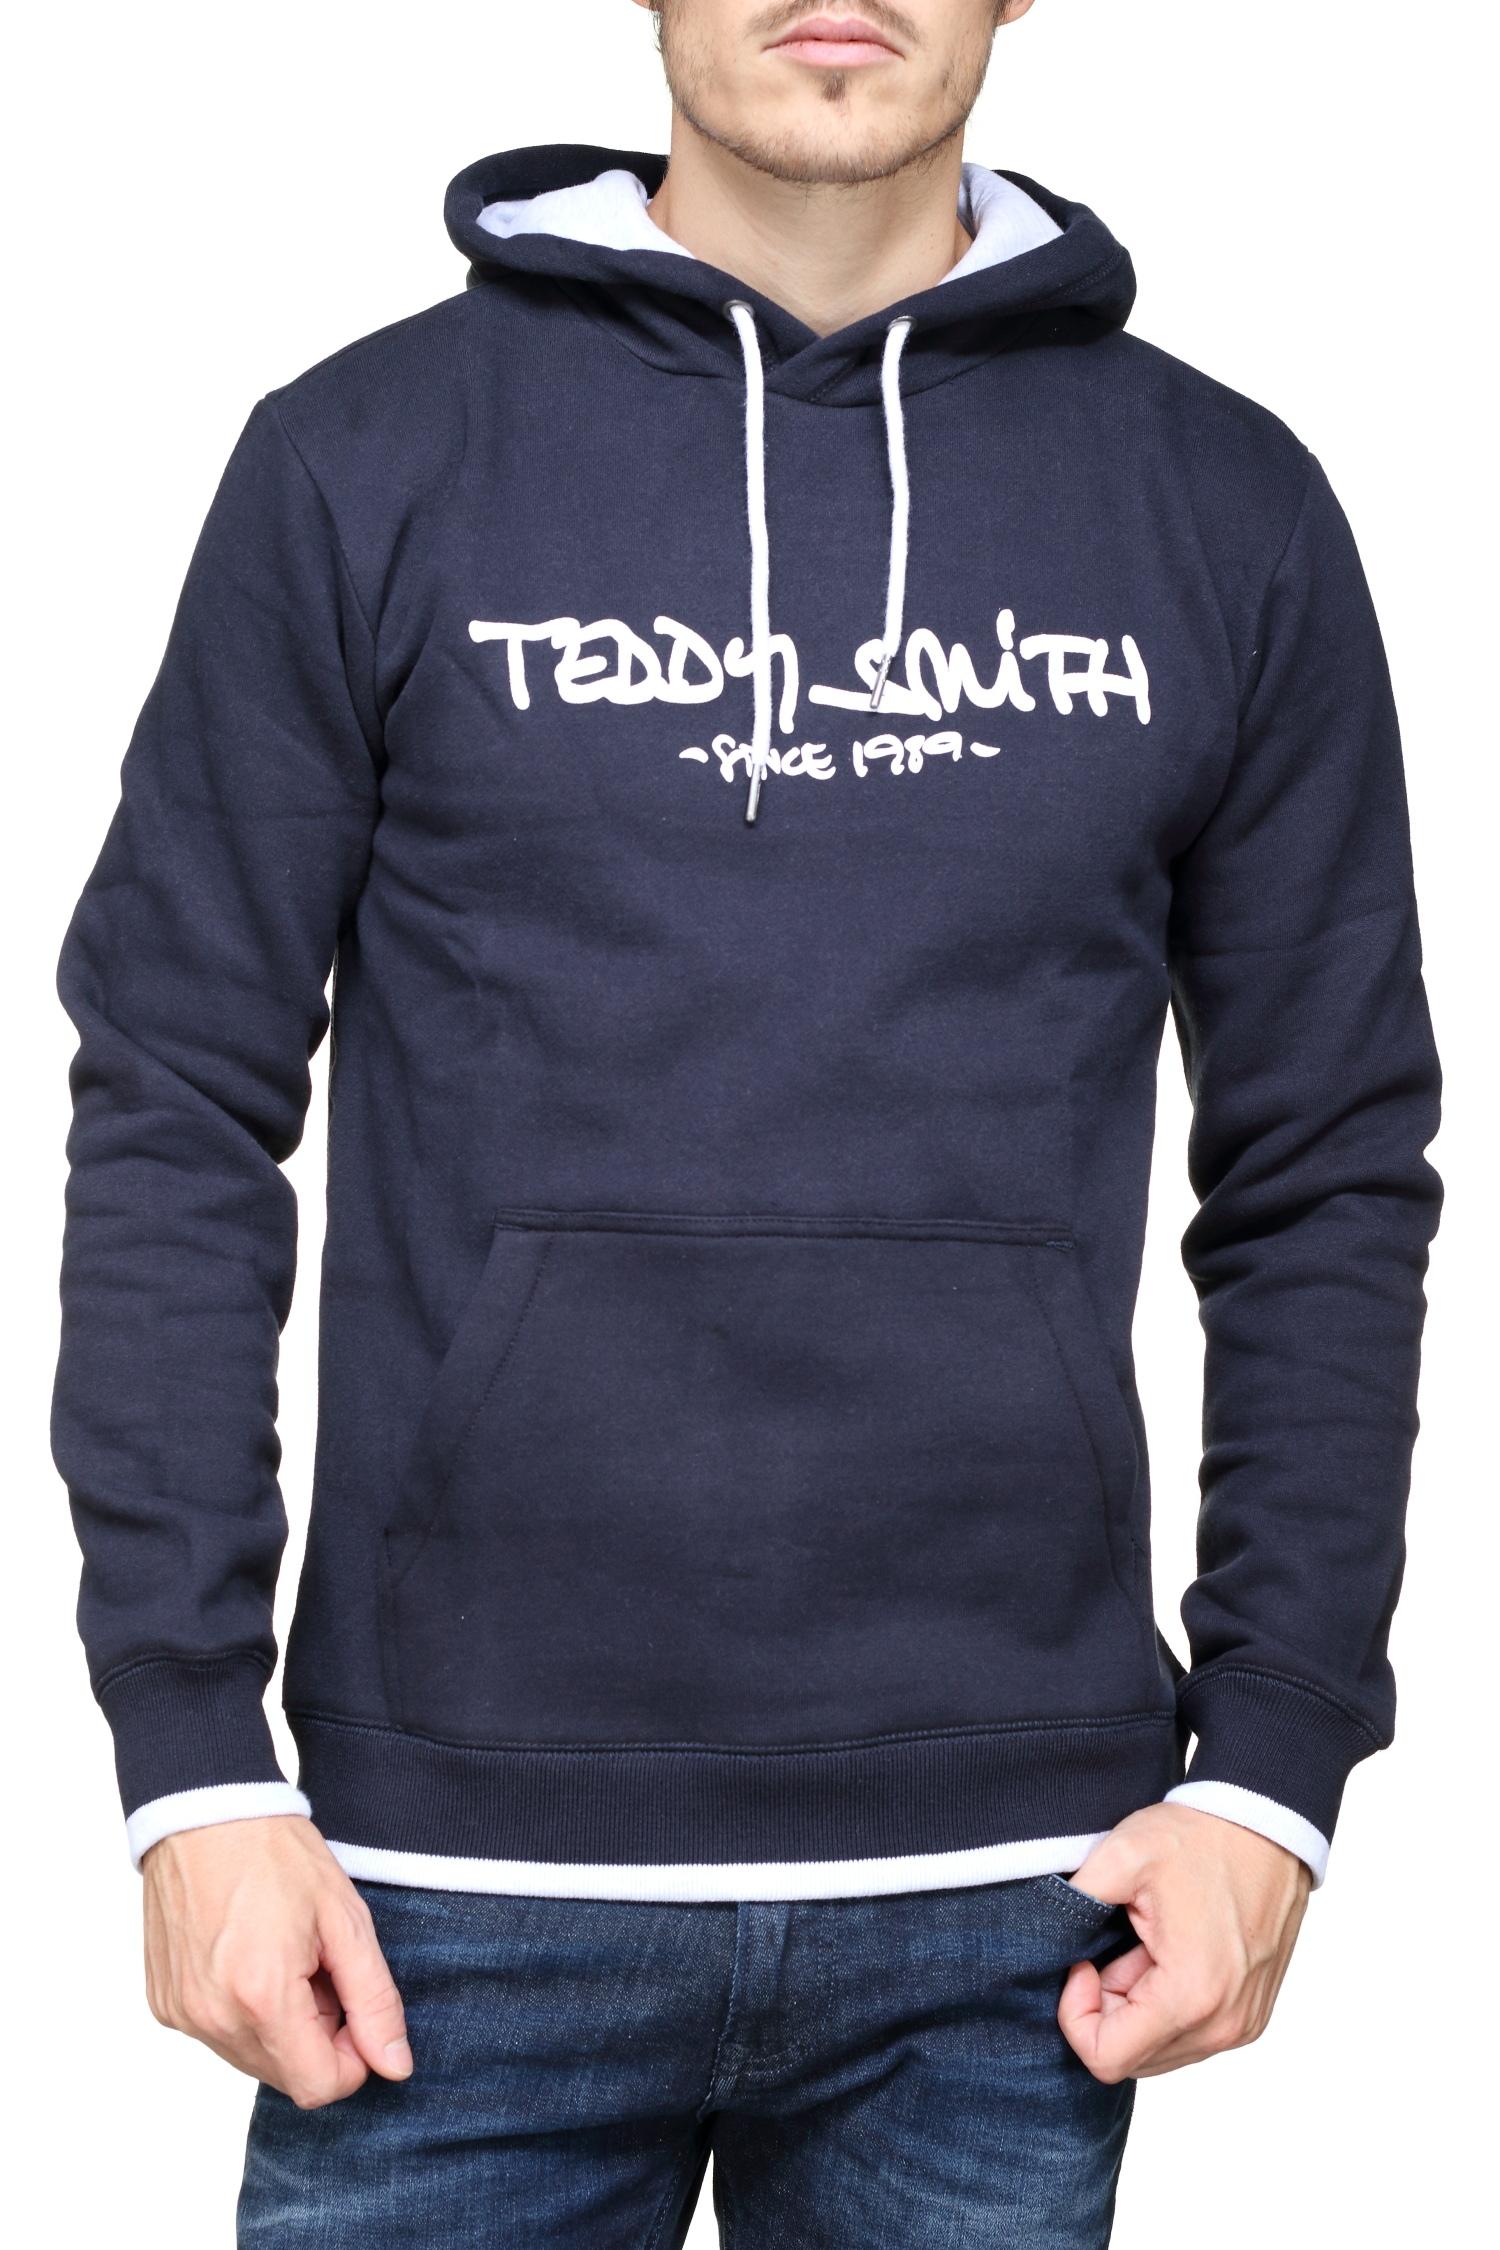 https://www.leadermode.com/155159/teddy-smith-siclass-hoody-10813636d-351-dark-navy.jpg